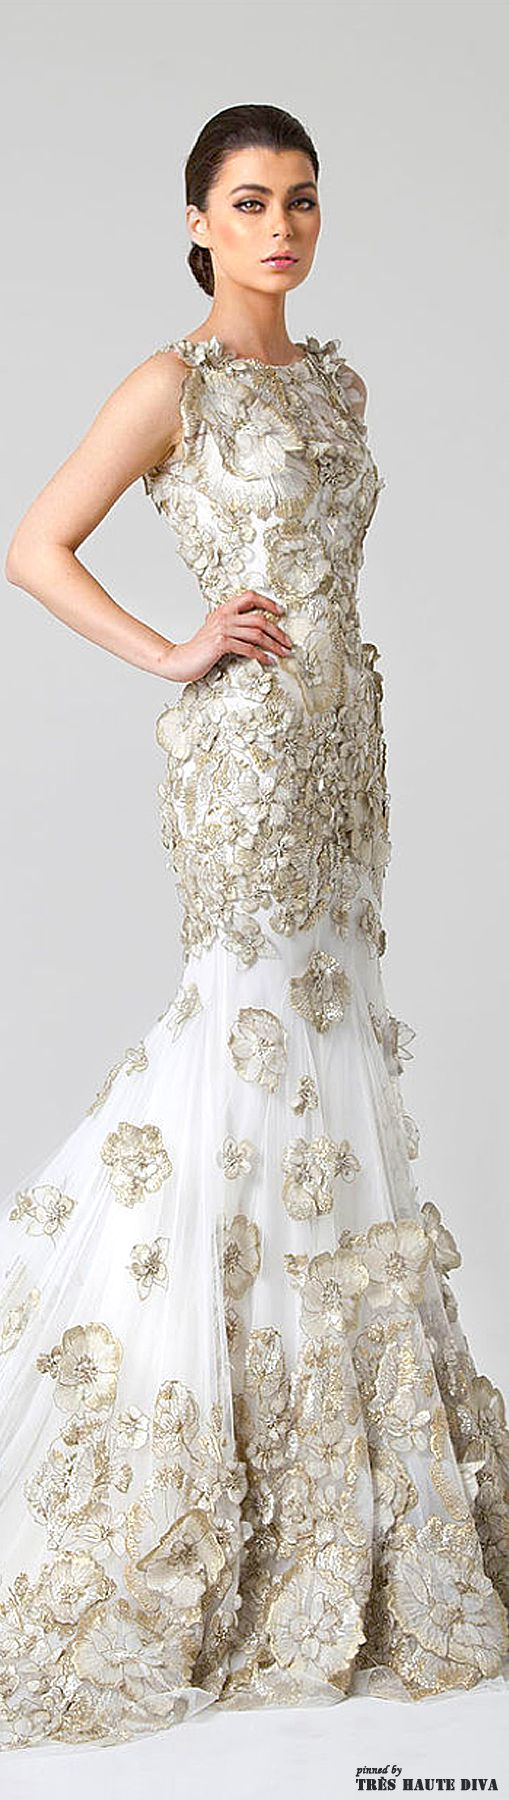 Amazing dress with gold accents / By: Rani Zakhem SS 2014 Bridal <3